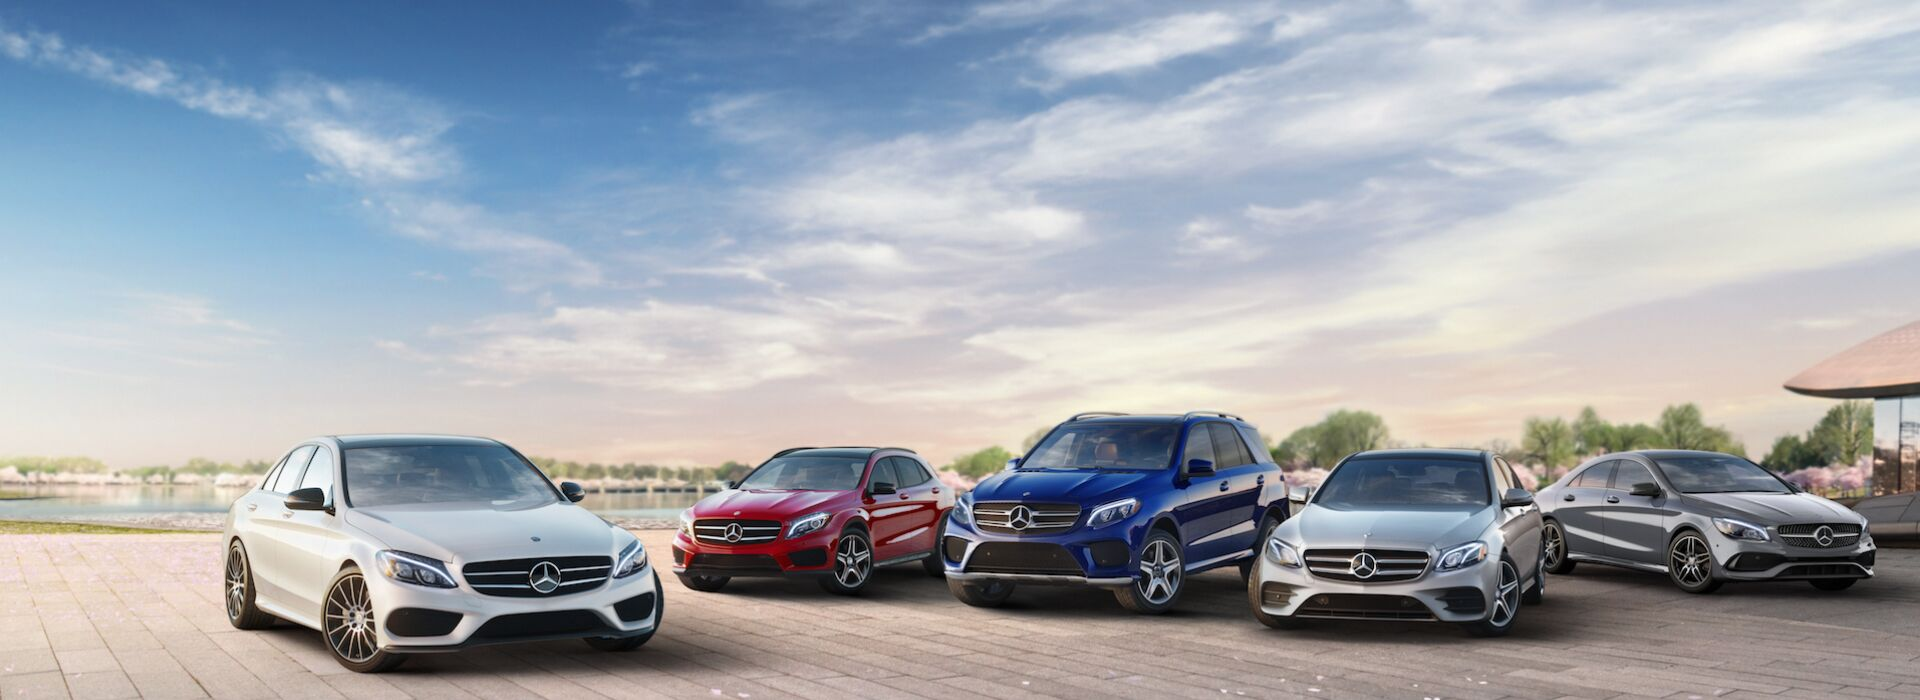 Mercedes Benz Partner Programs